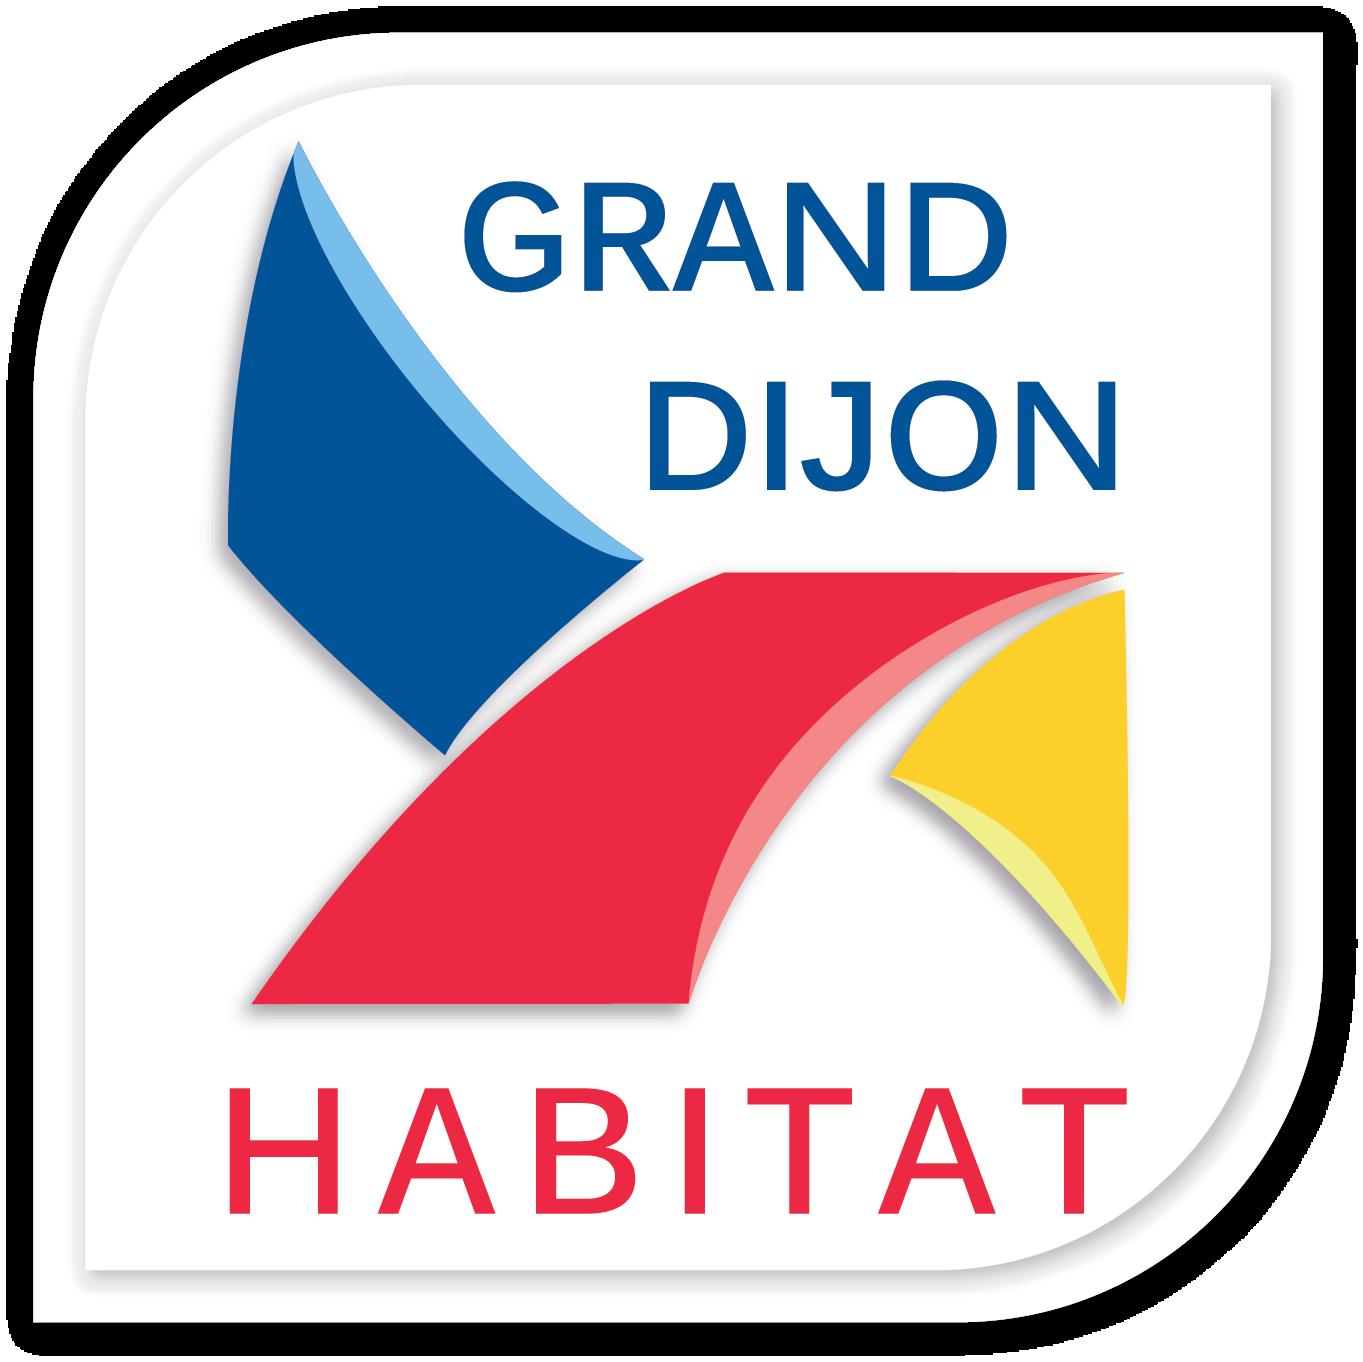 7. GRAND DIJON HABITAT